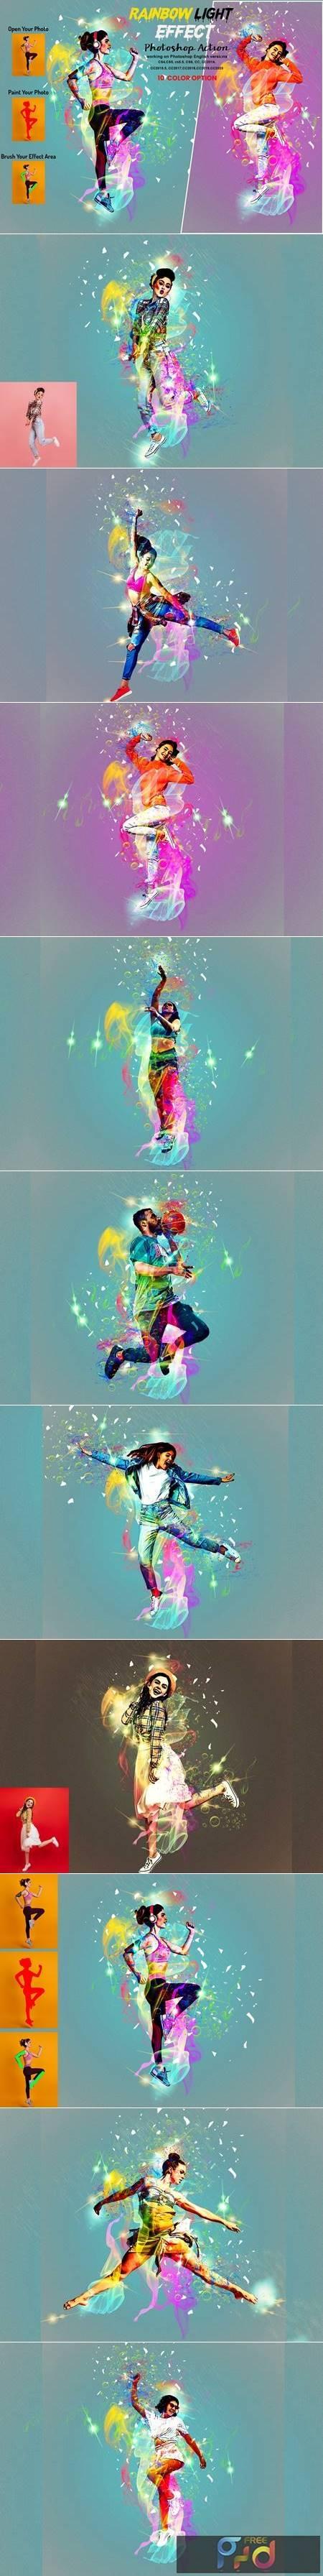 Rainbow Light Effect PS Action 5940257 1